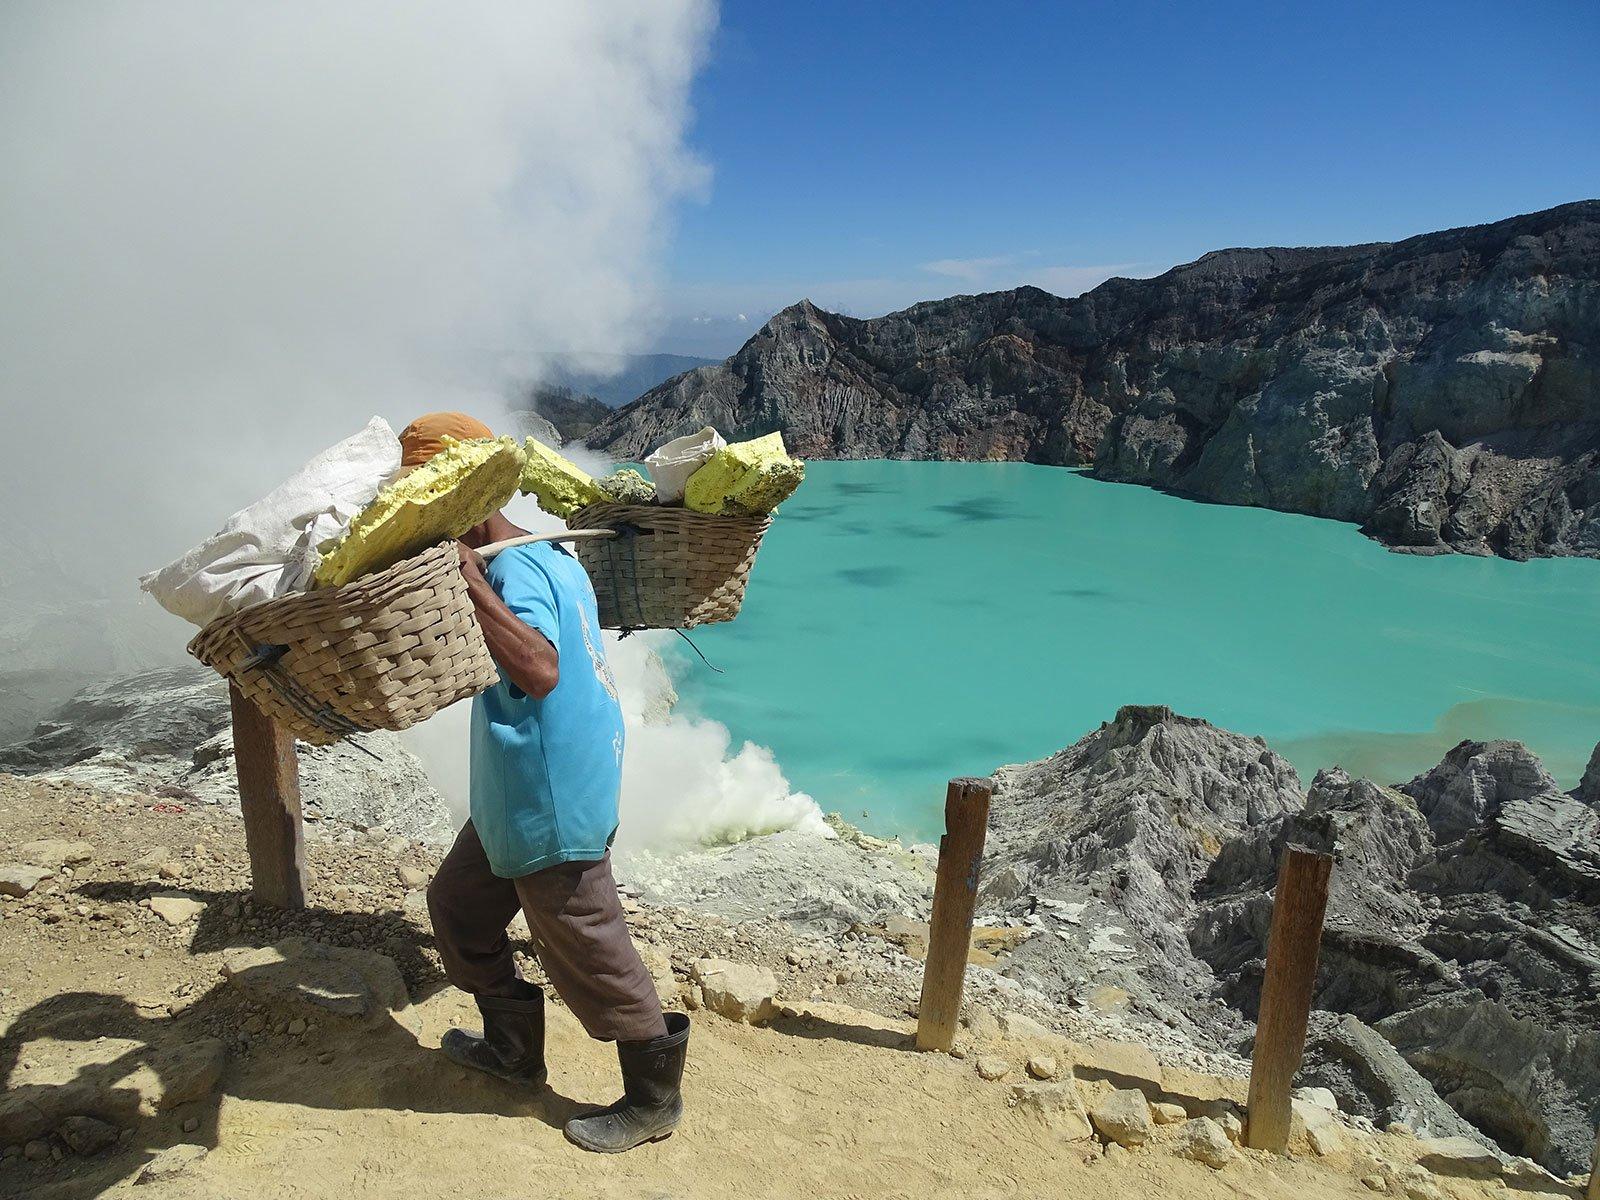 reisspecialist shilla verburgt favoriete fotos ijen vulkaan java